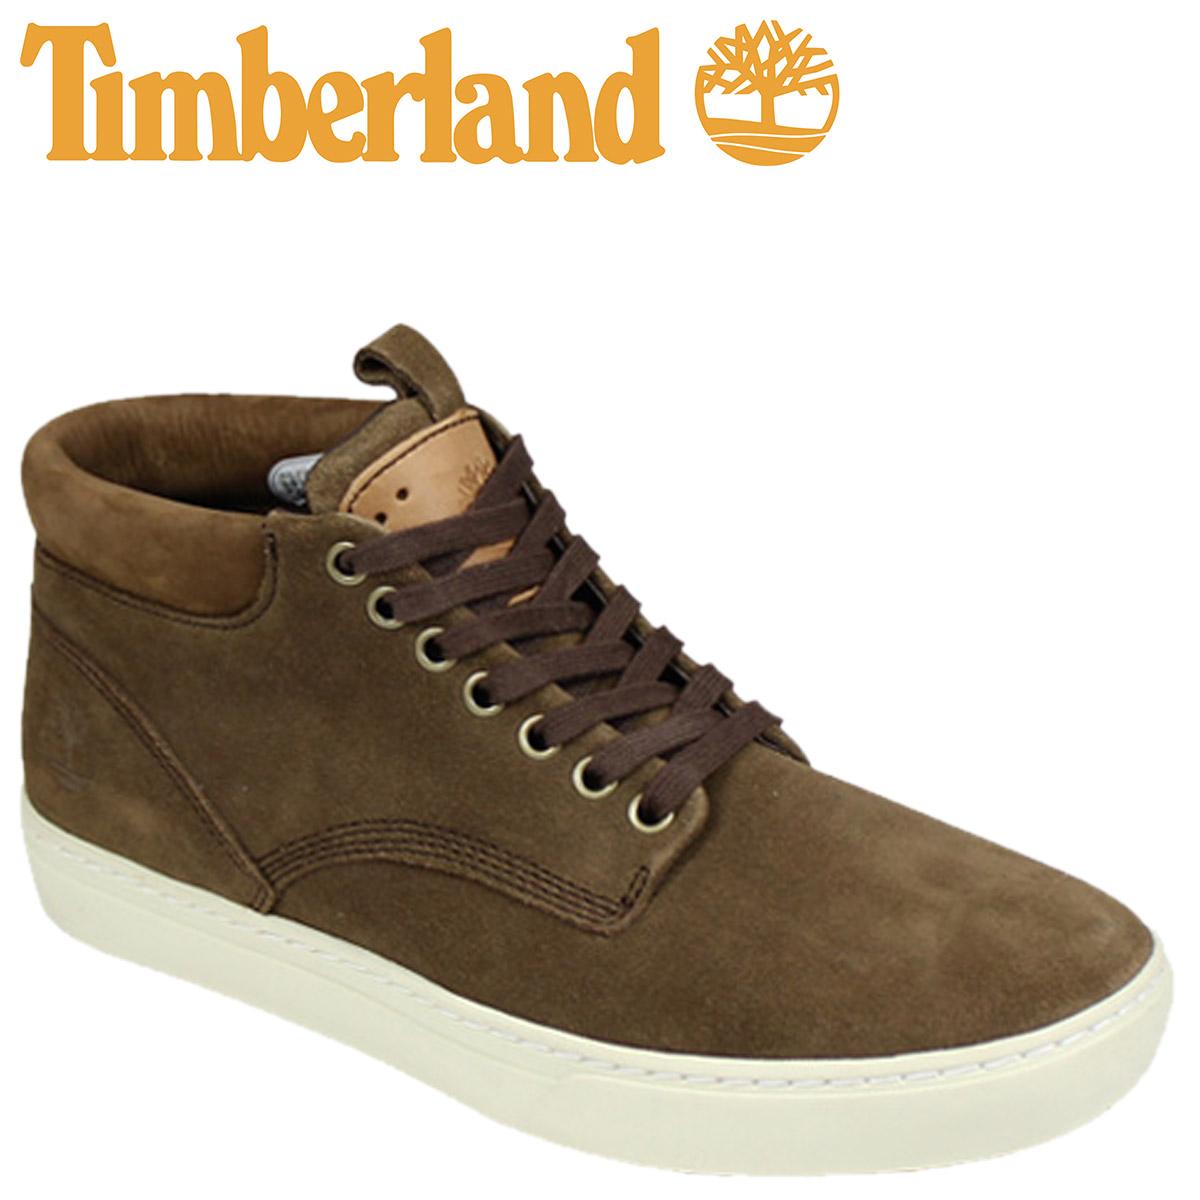 timberland earthkeeper 2.0 cupsole chukka boots